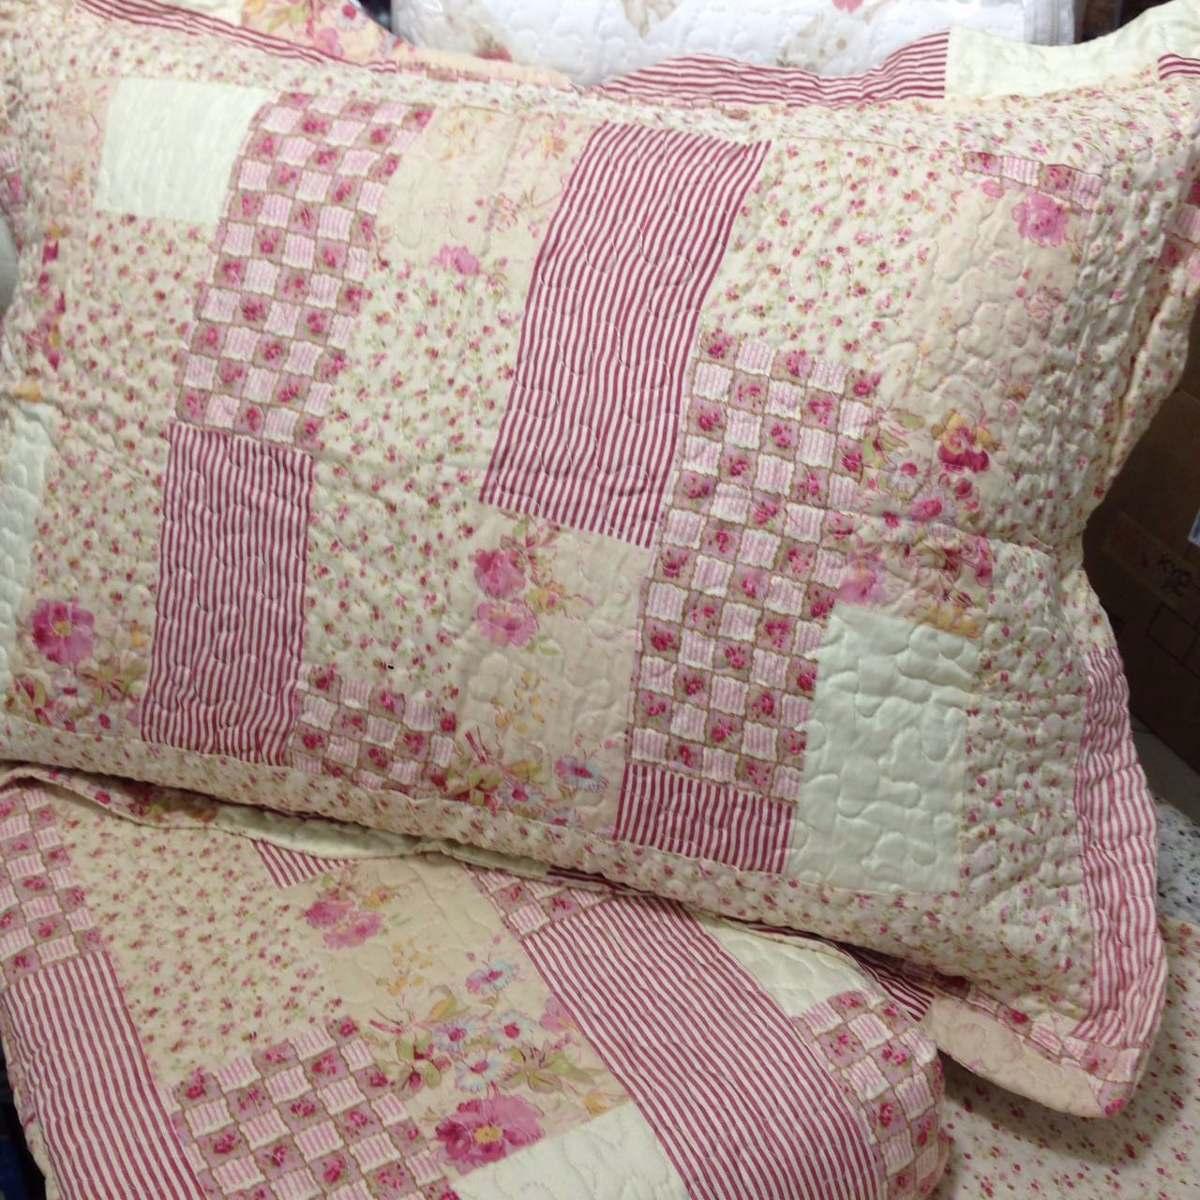 Colcha patchwork andreza queen microfibra matelada estampa 7 r 149 90 em mercado livre - Colcha patchwork ...